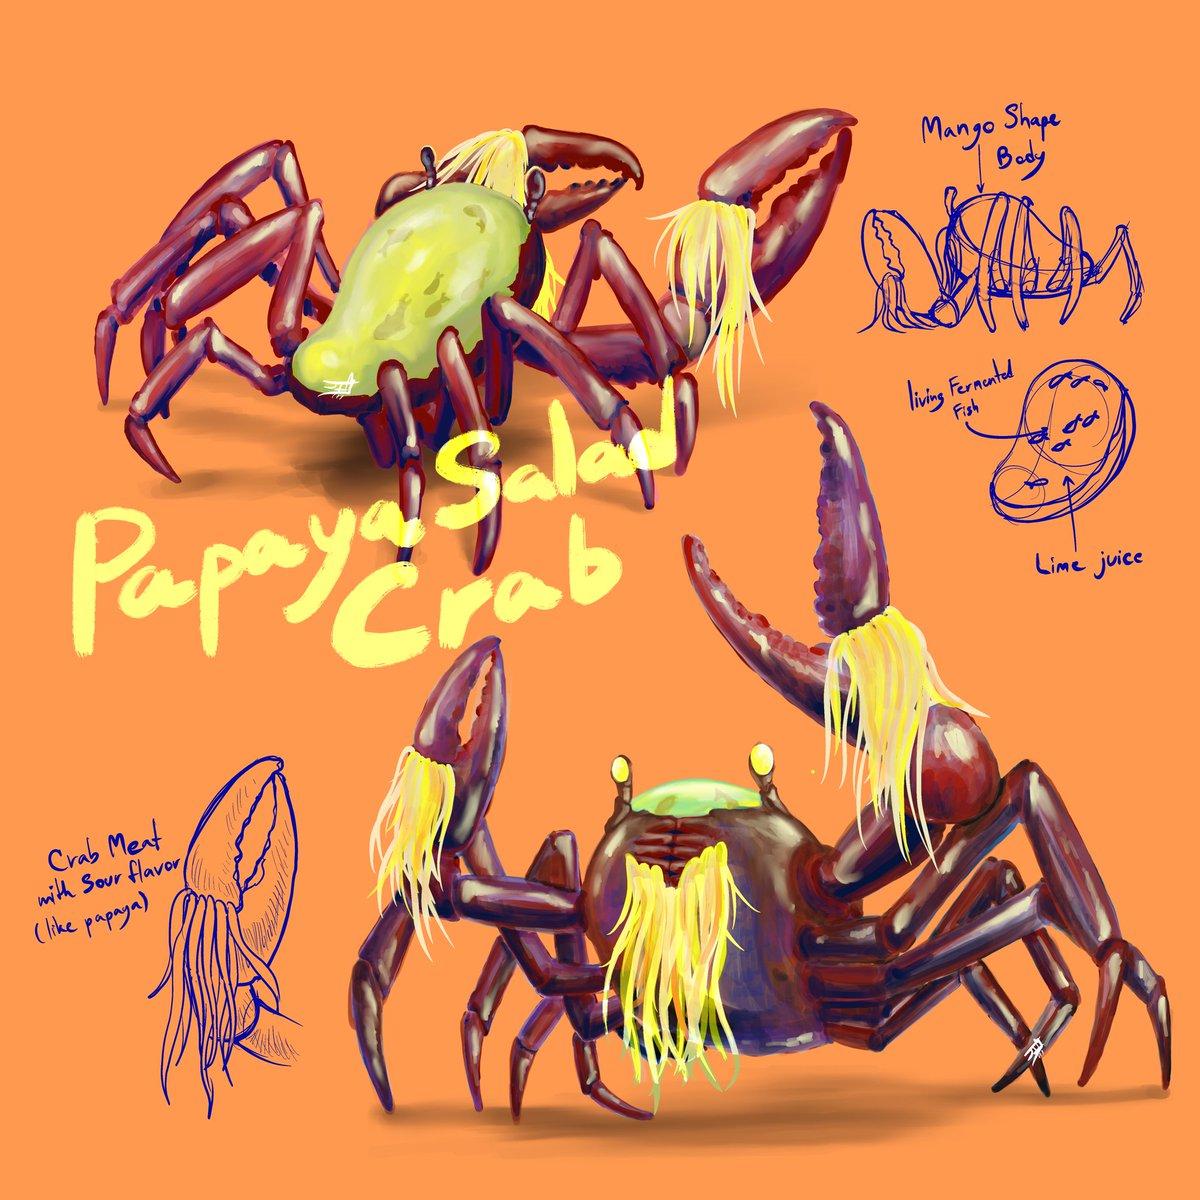 Papaya Salad Crab  #waadraid #papayasalad #crab #somtum #fermentedfish #papaya #salad #food #thaidish #thai #illustration #illustrator #characterdesign #monster #creature #creaturedesign #animal #Cuisine